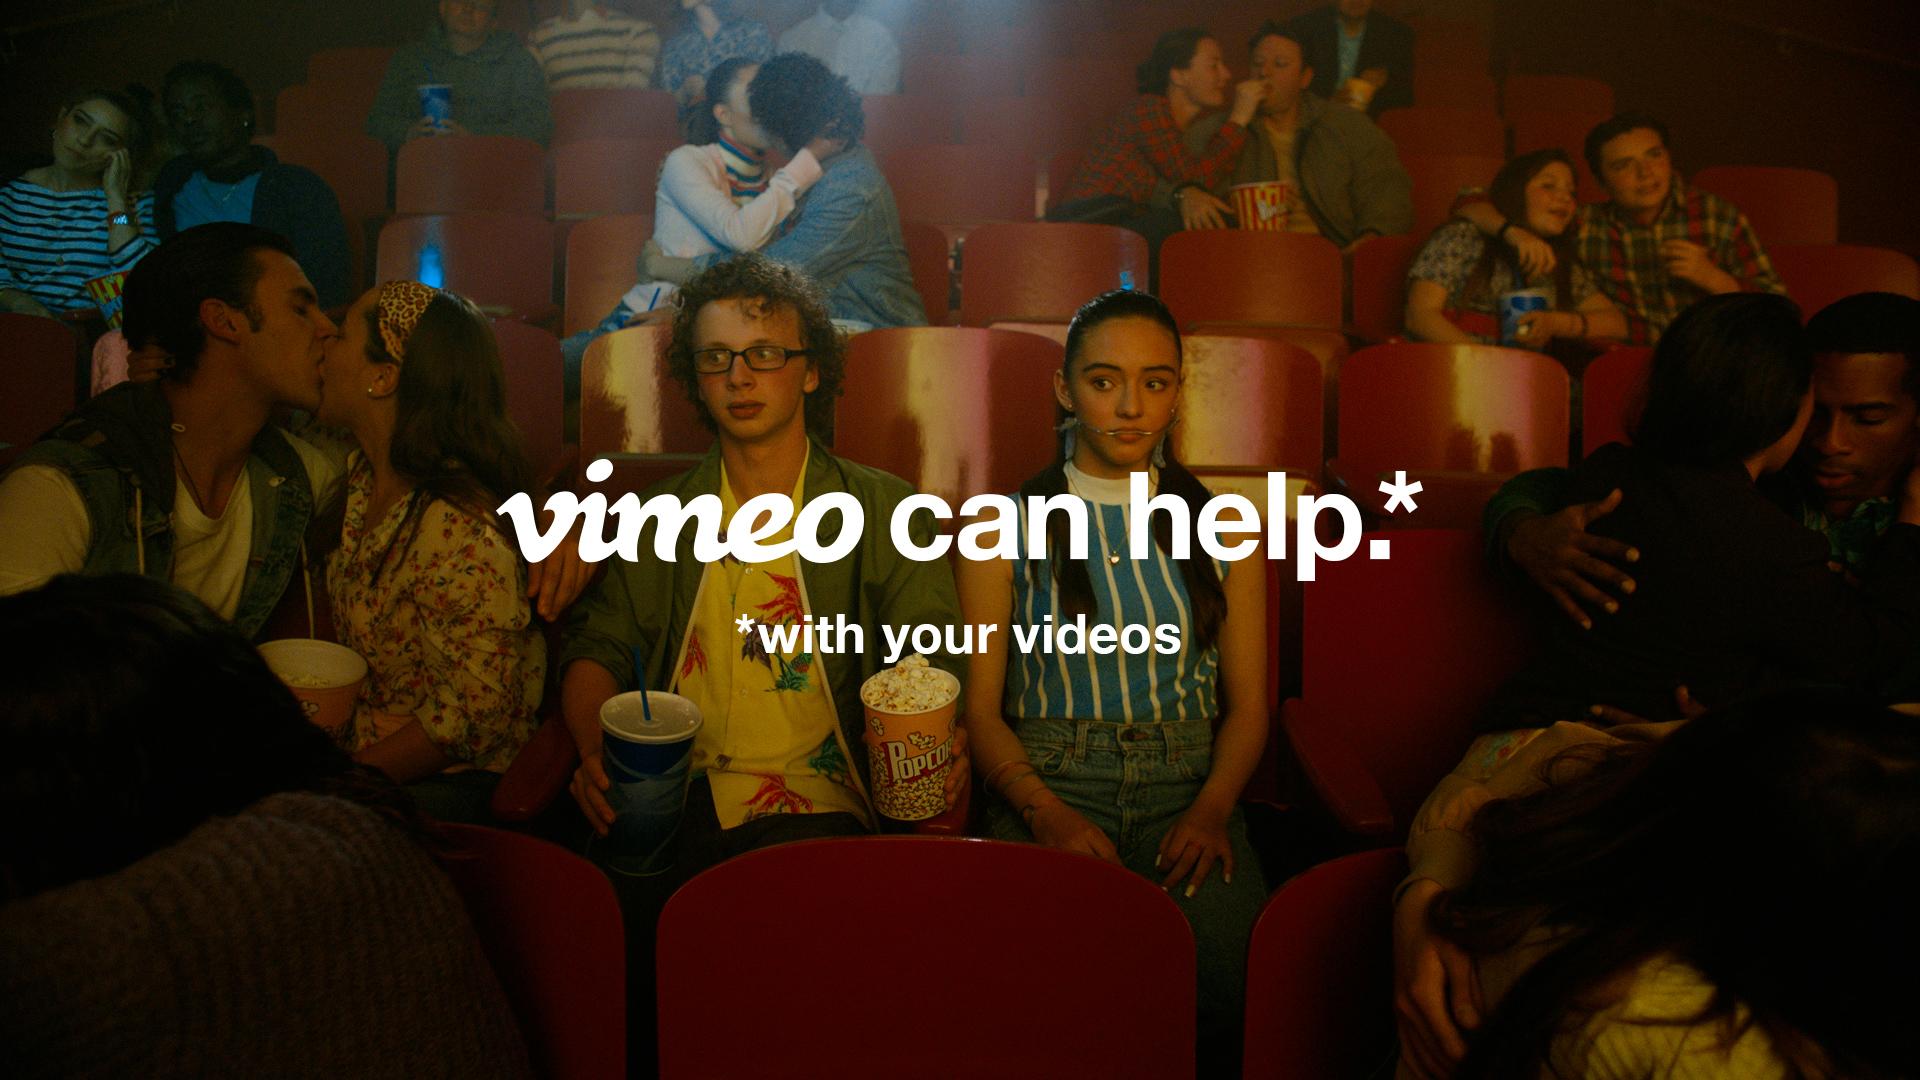 VimeoCanHelp-Films-HeaderImage.jpg